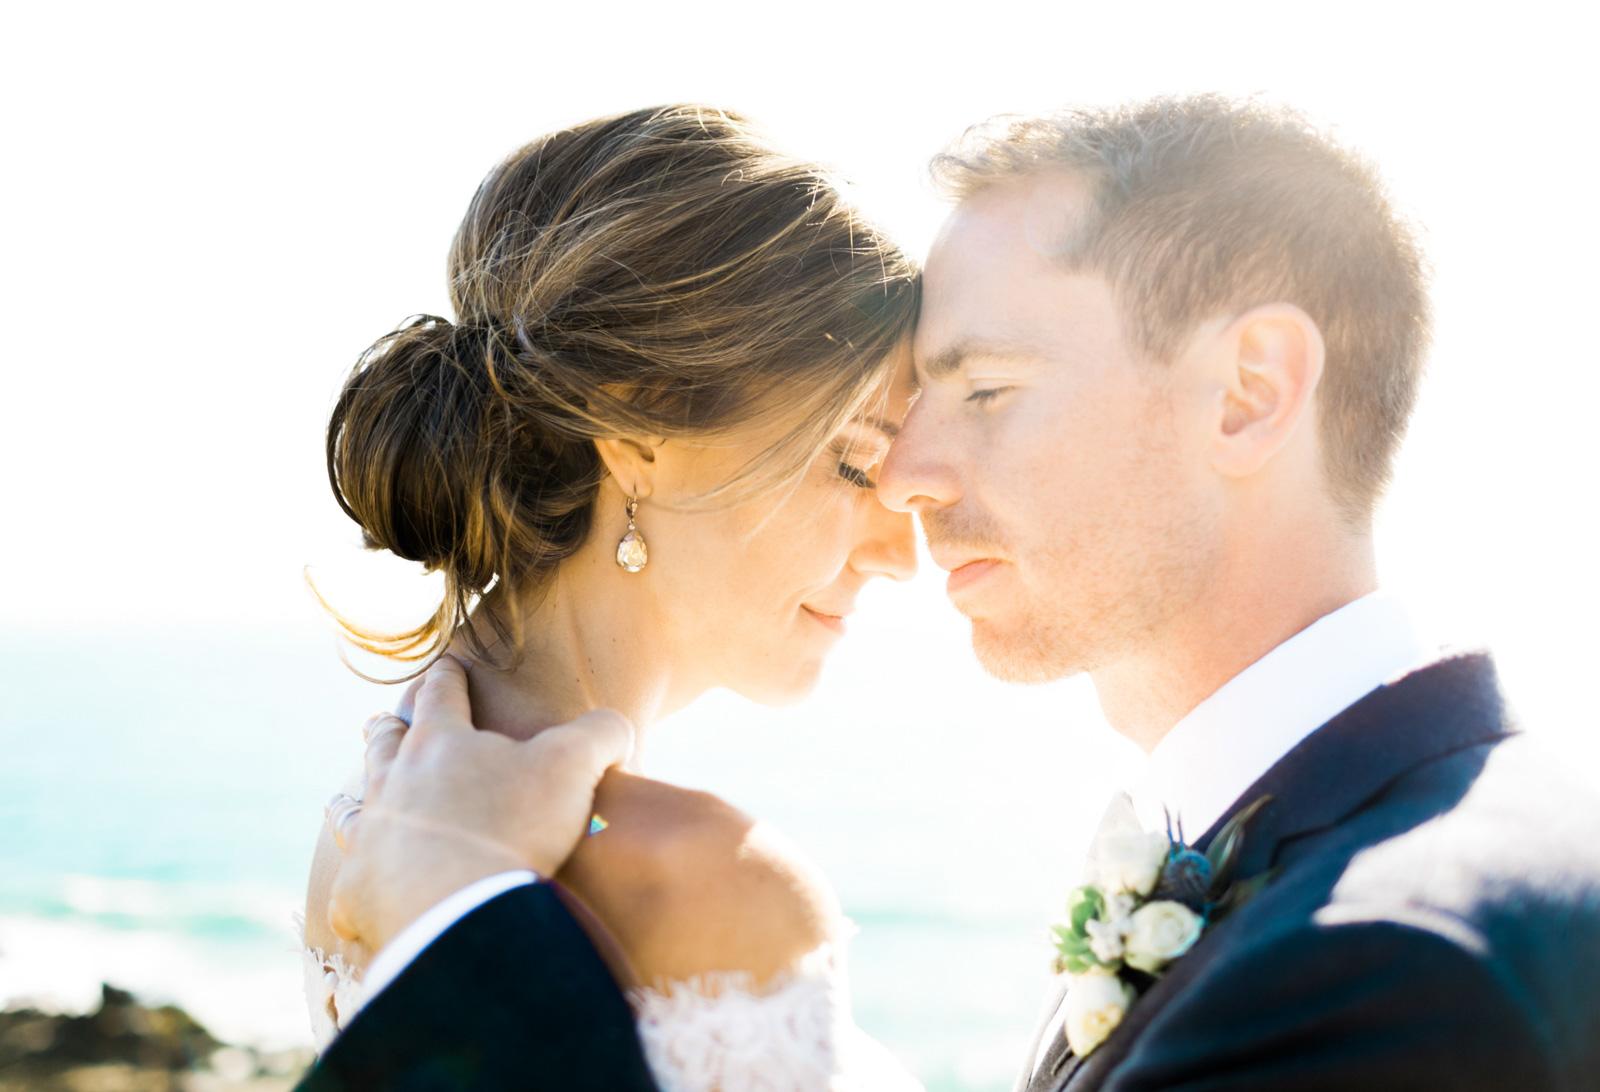 Style-Me-Pretty-Mendocino-Wedding-Natalie-Schutt-Photography_14.jpg